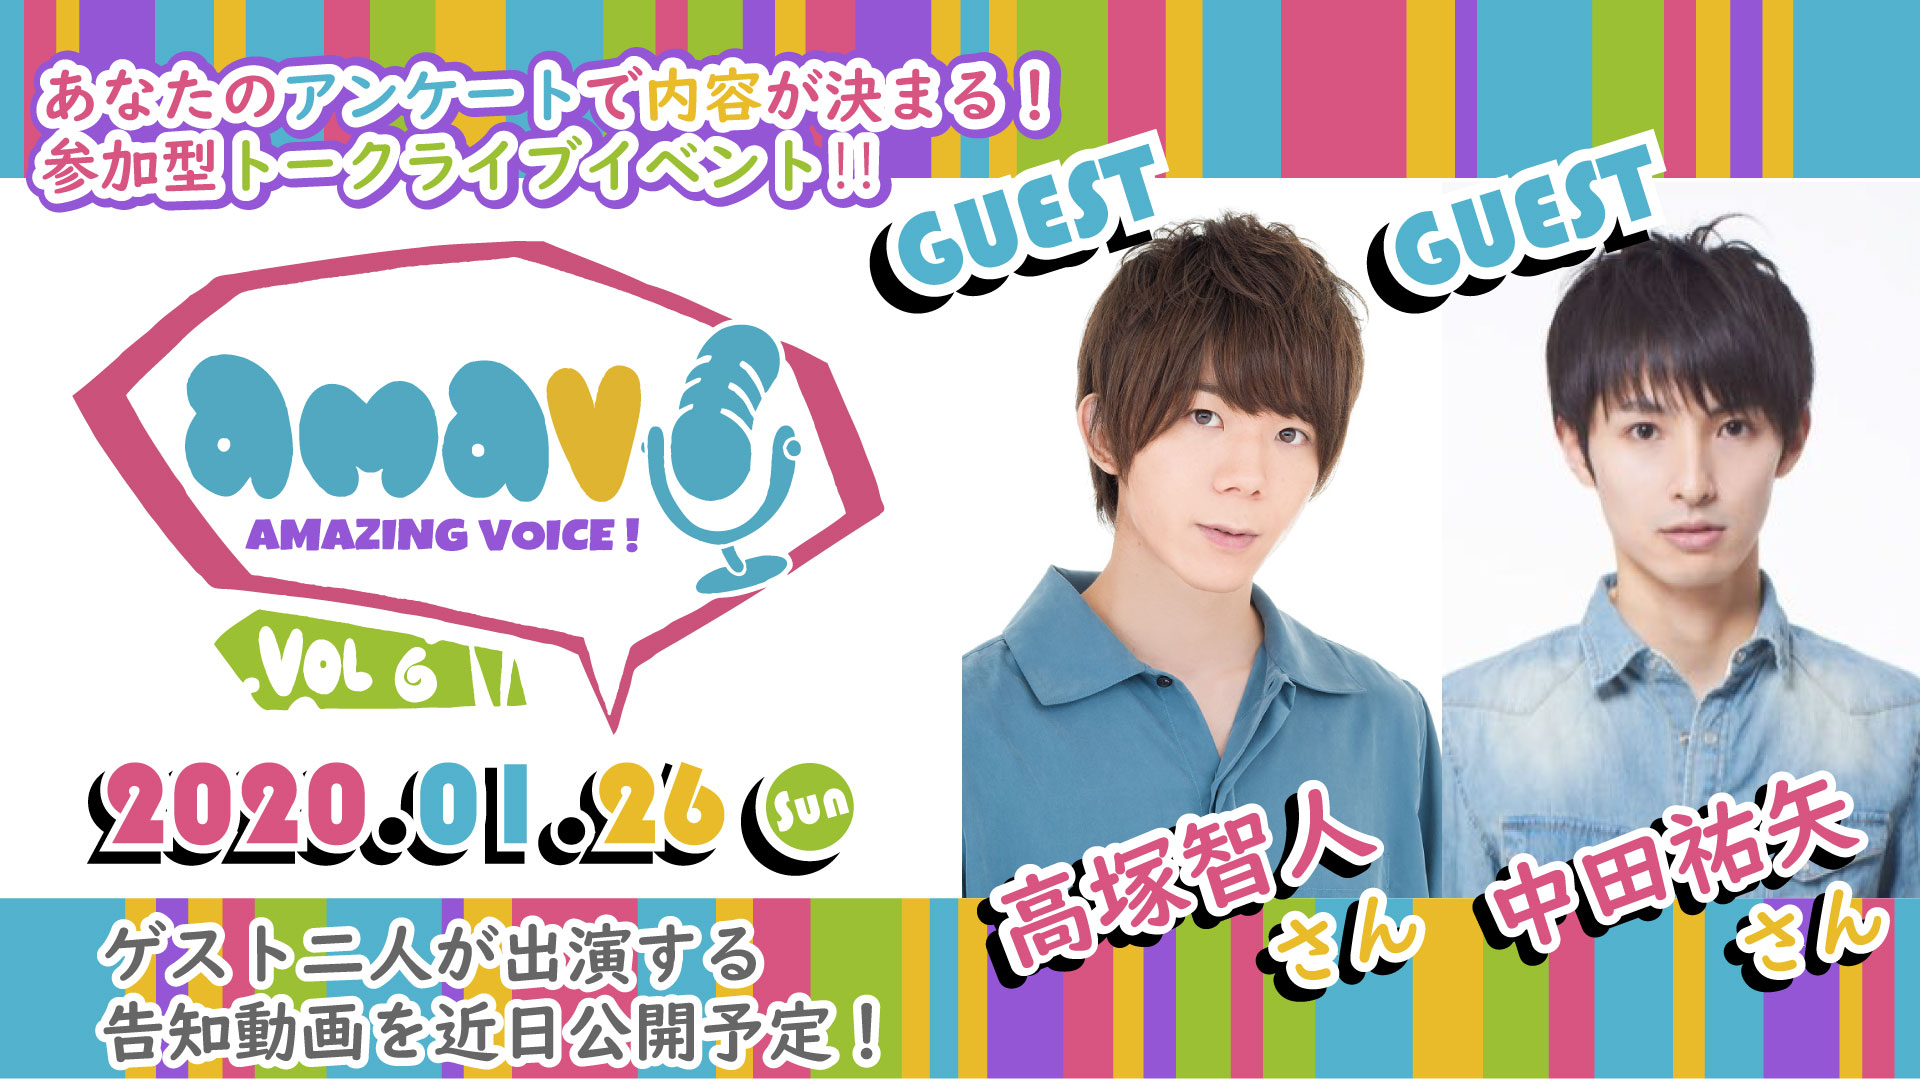 amavo vol.6 【Guest:高塚智人さん 中田祐矢さん】